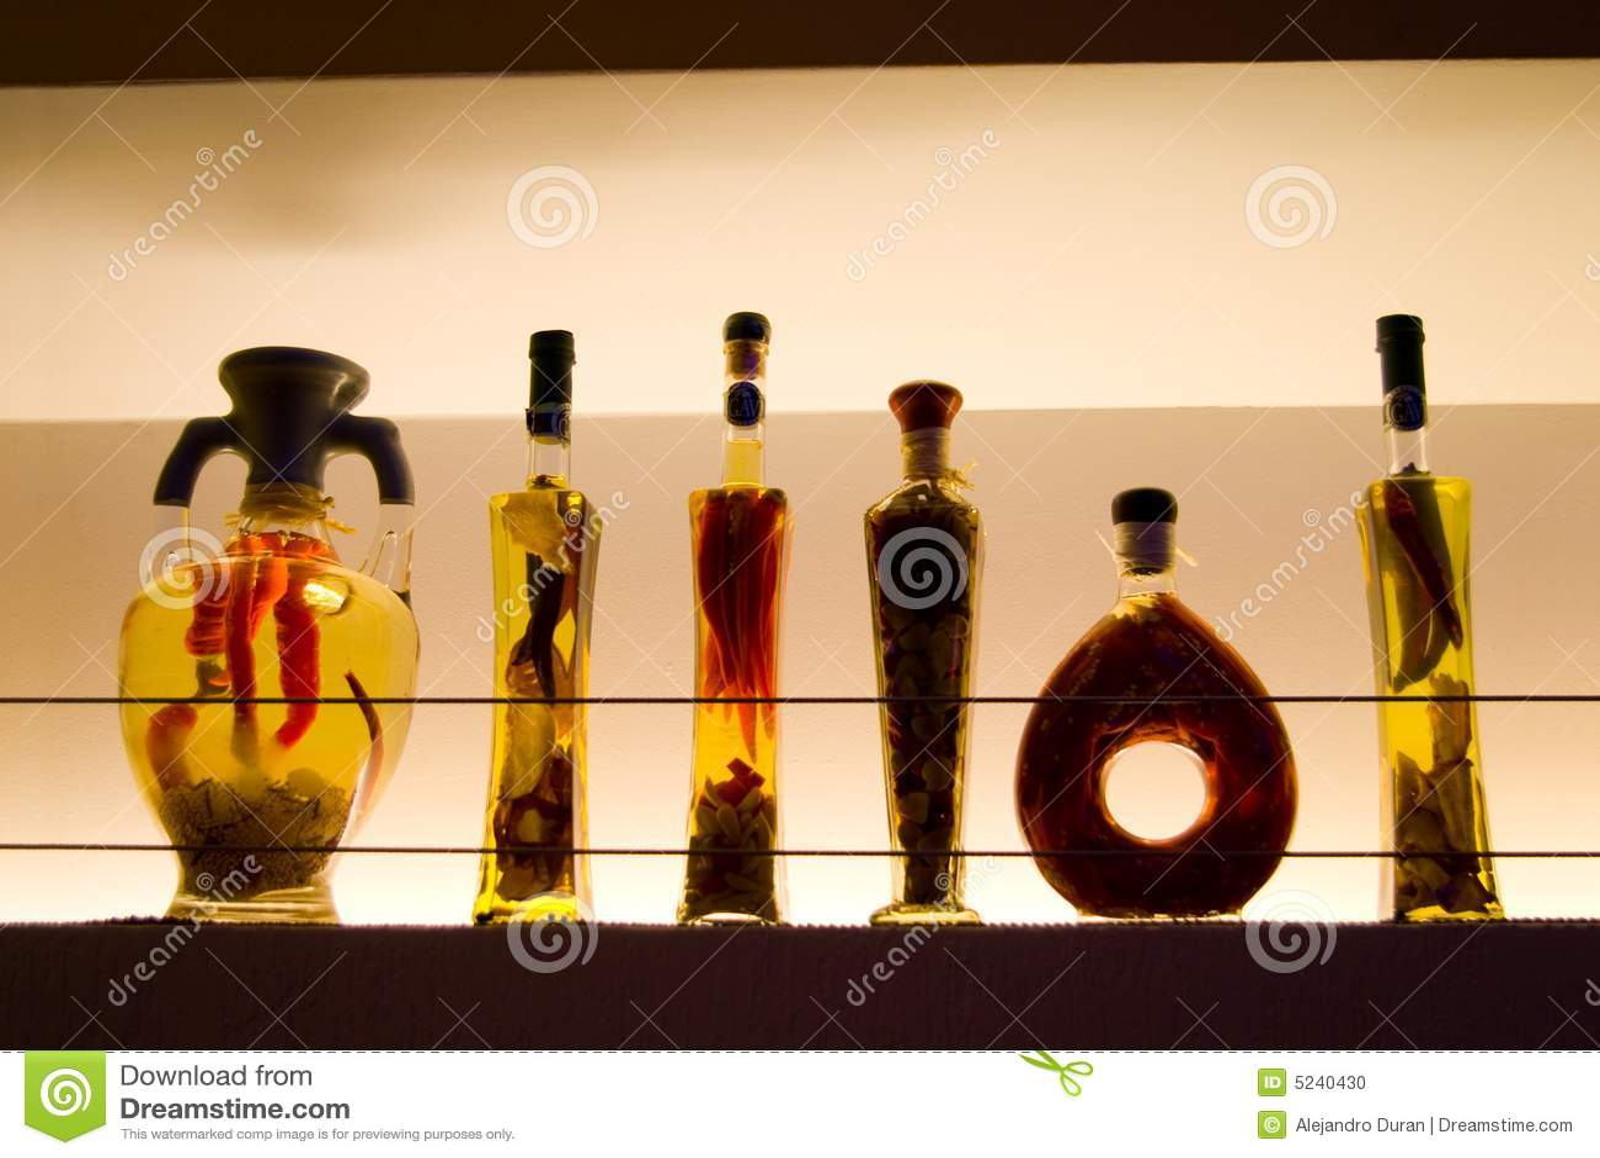 Bottles bar I